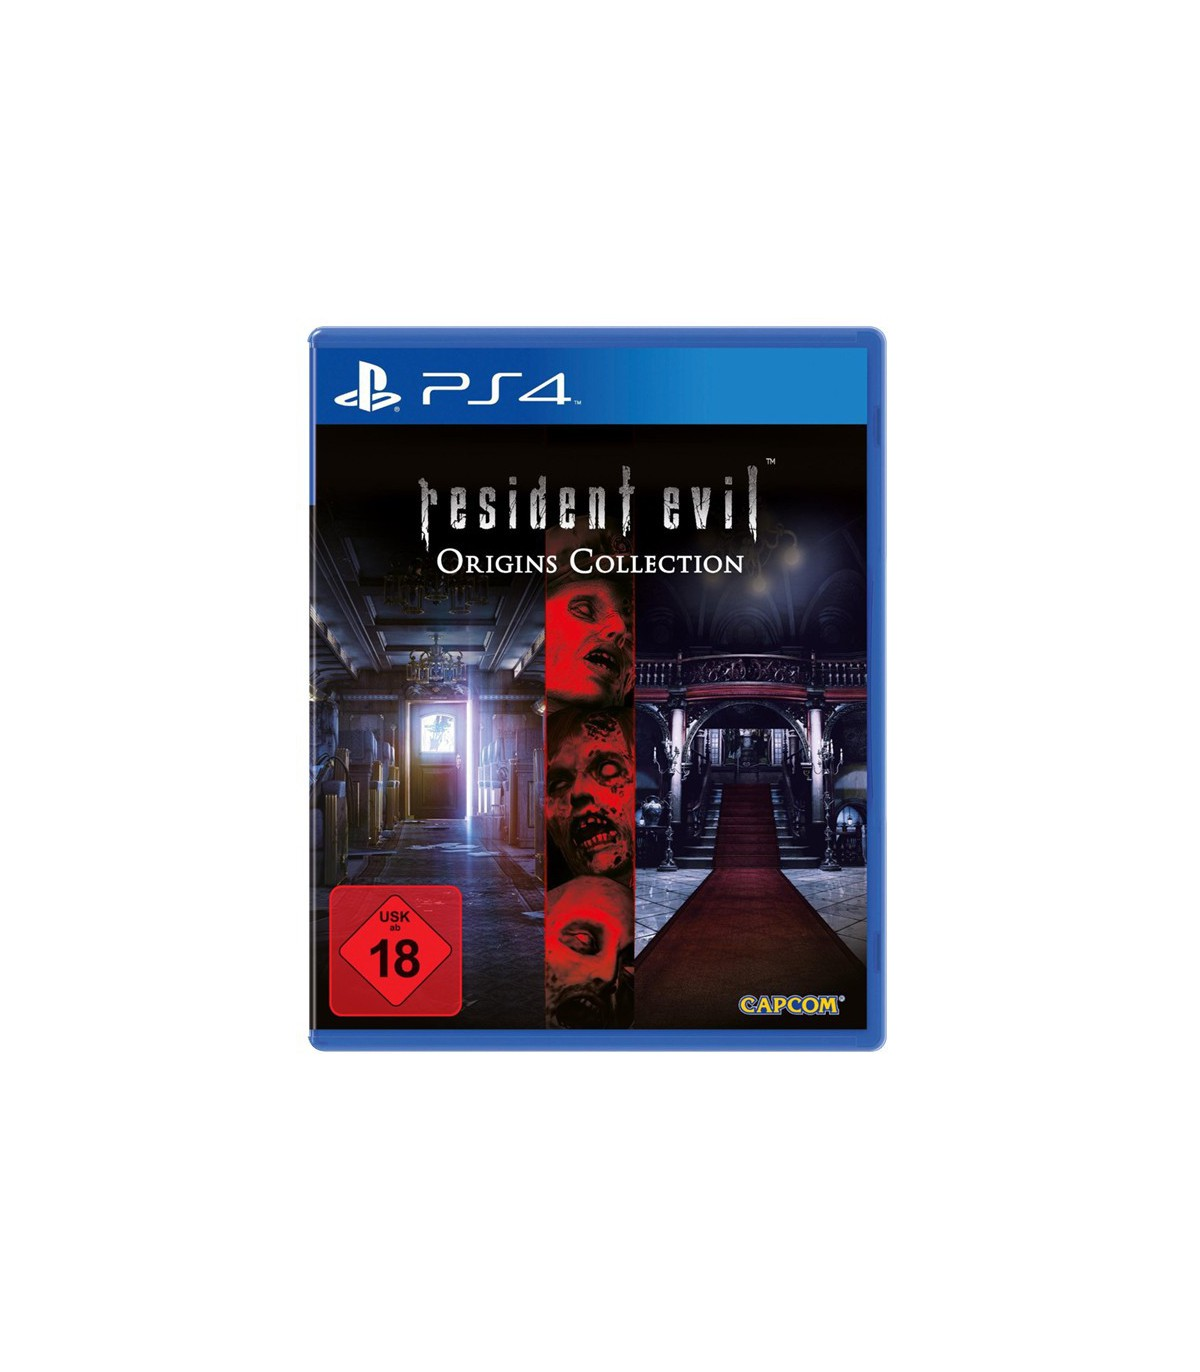 بازی Resident Evil Origins Collection کارکرده